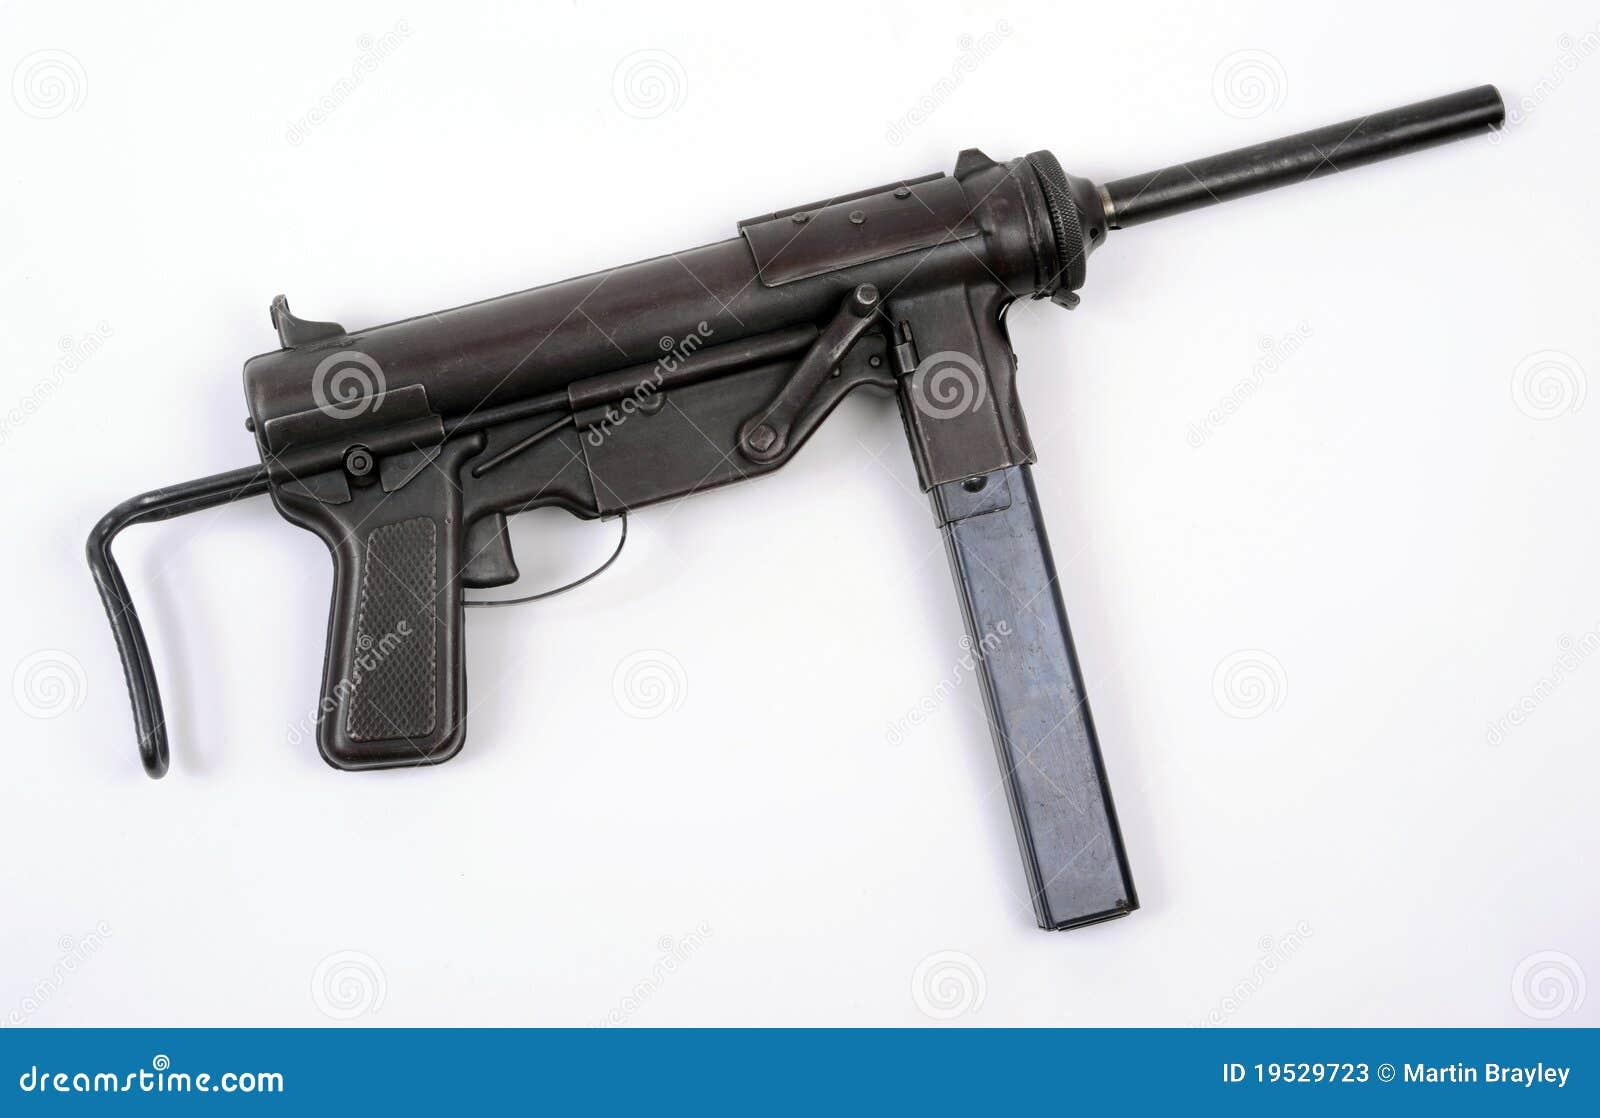 German Ww2 Machine Guns US WW11 M3 sub machine gun